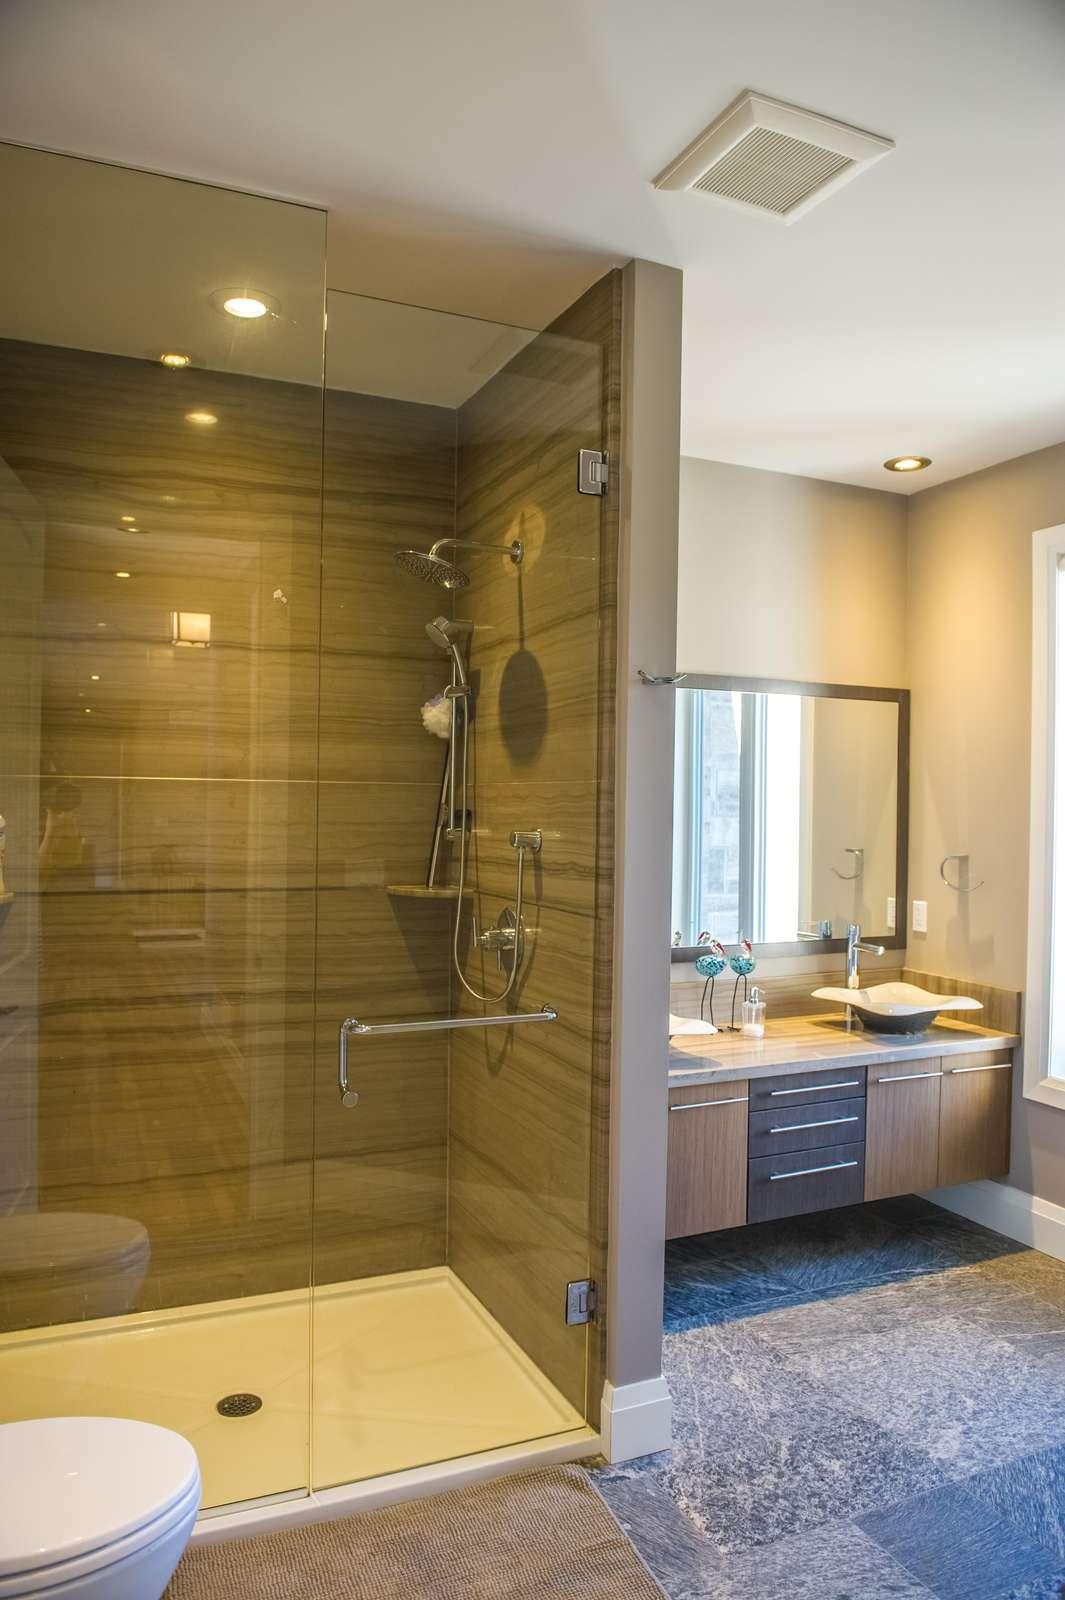 Another bathroom